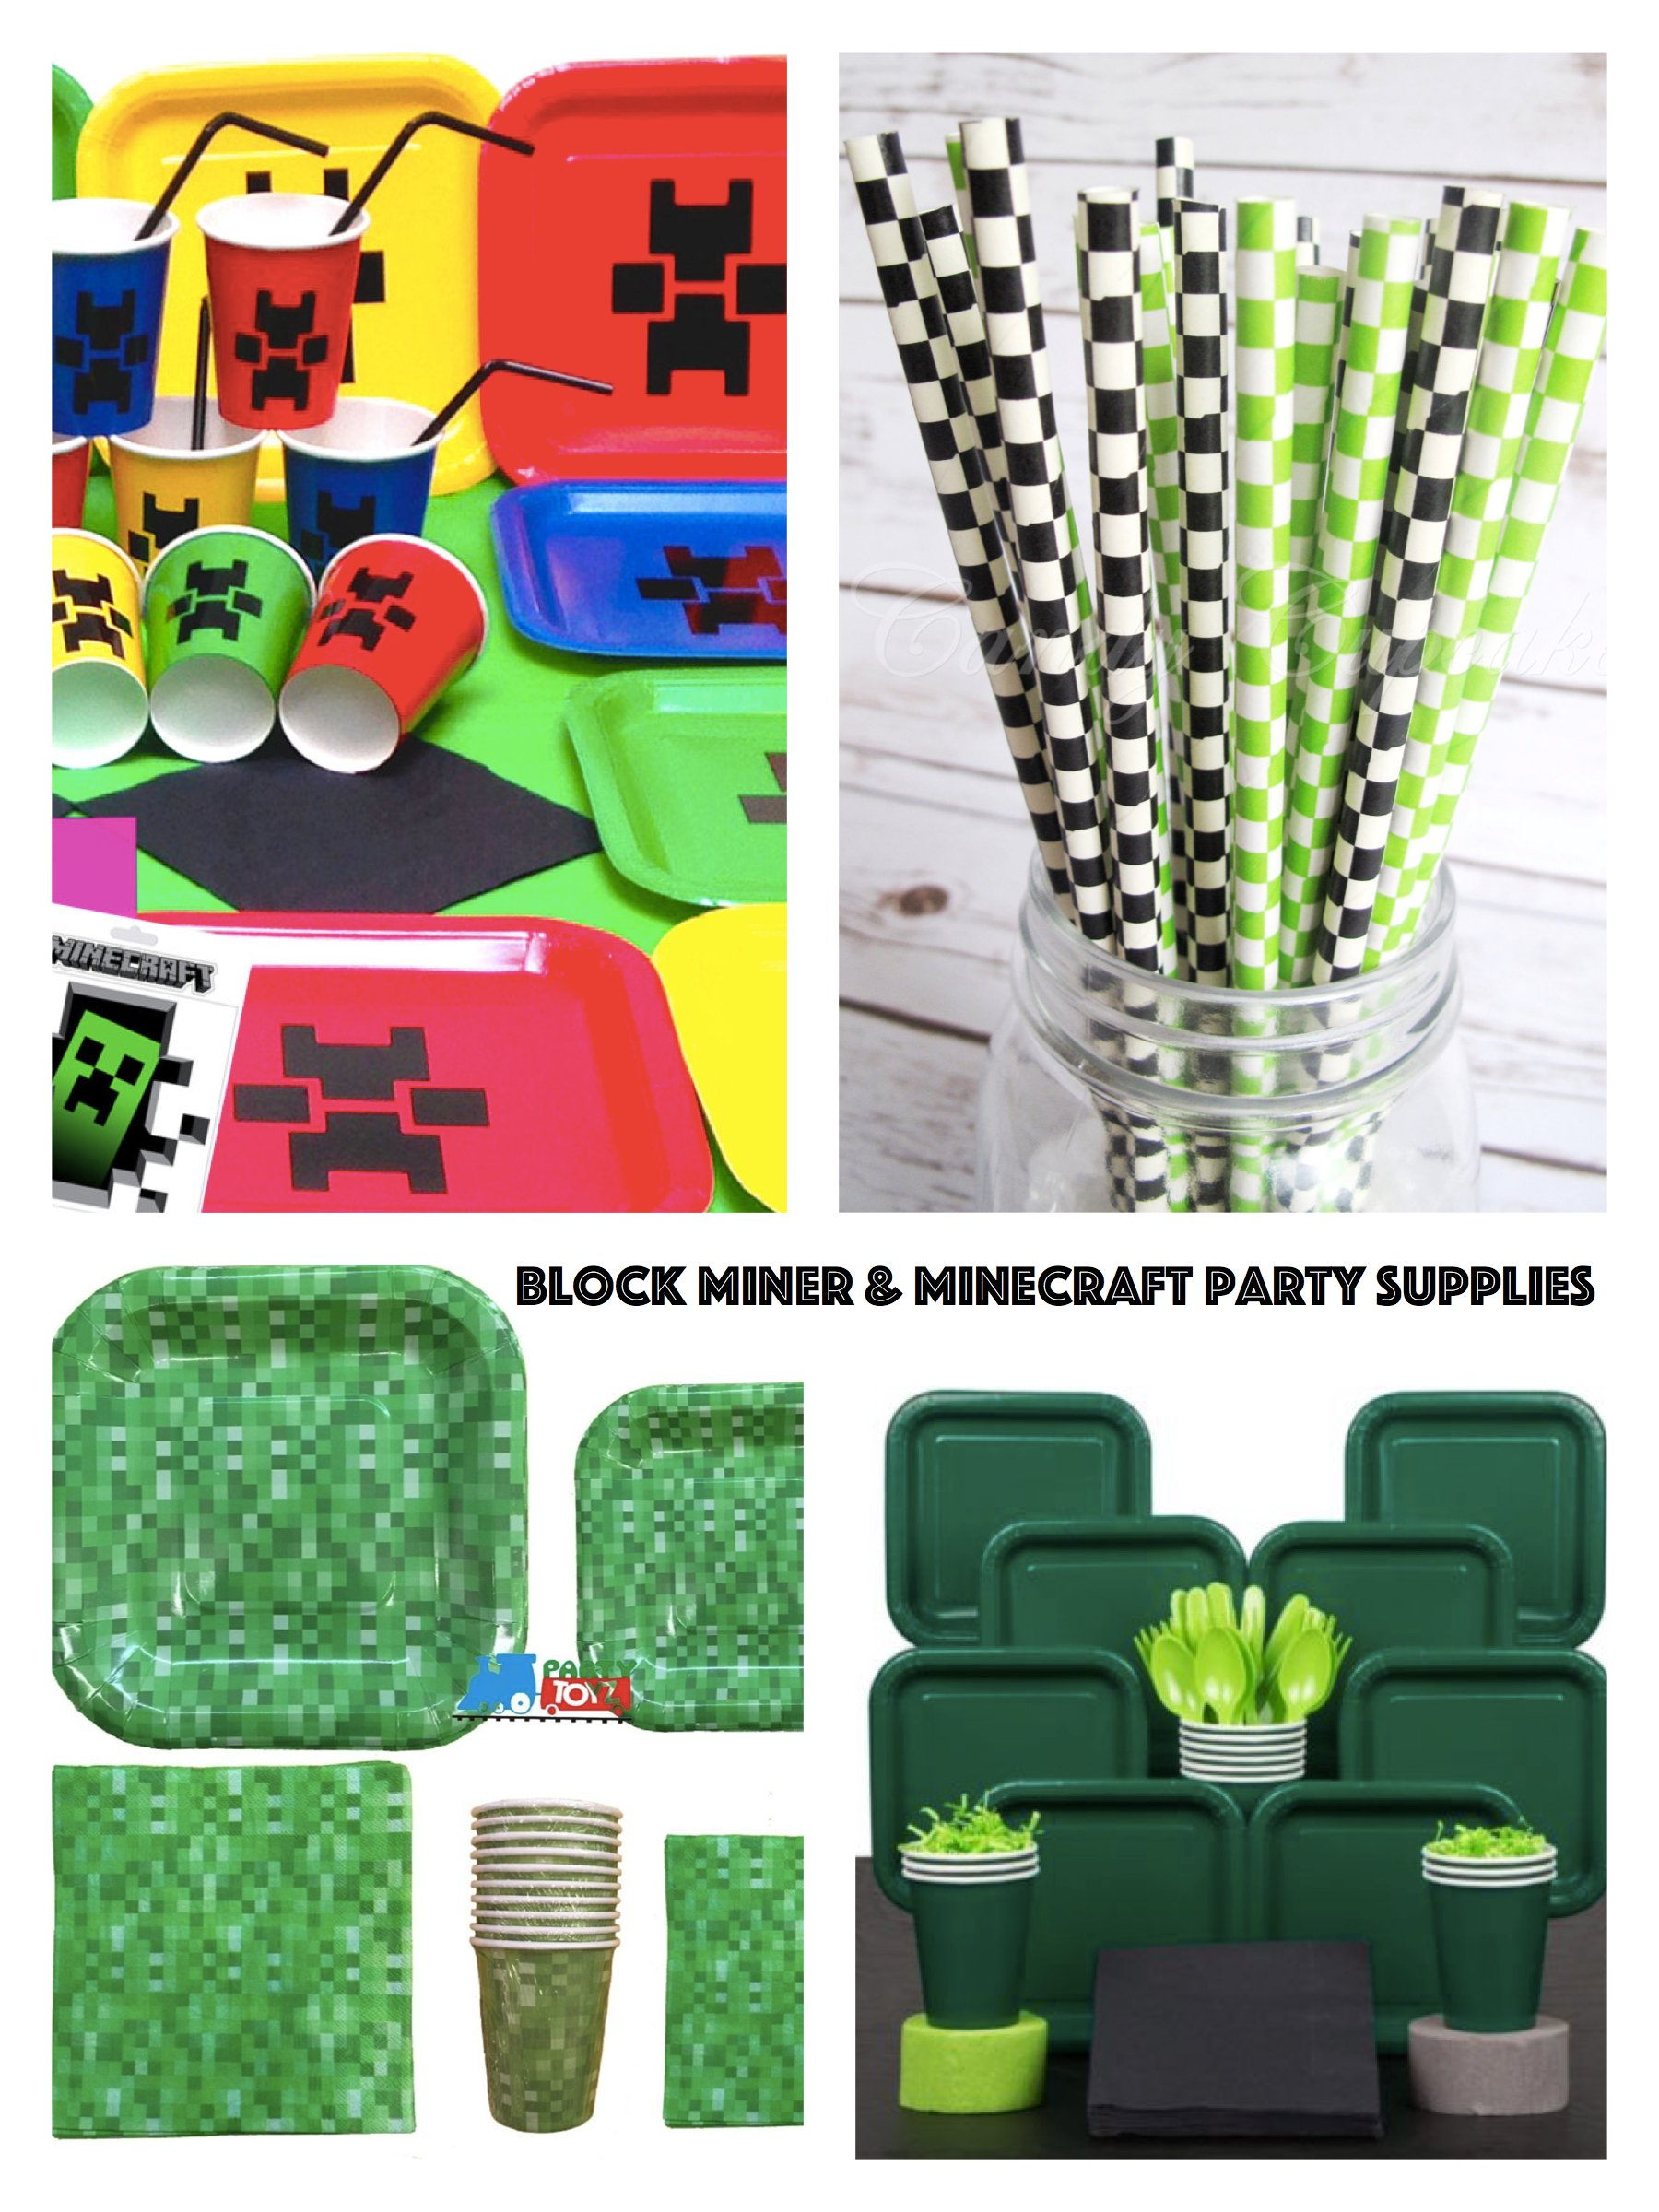 Minecraft Party Decorations Block Miner Minecraft Party Planning Ideas Supplies